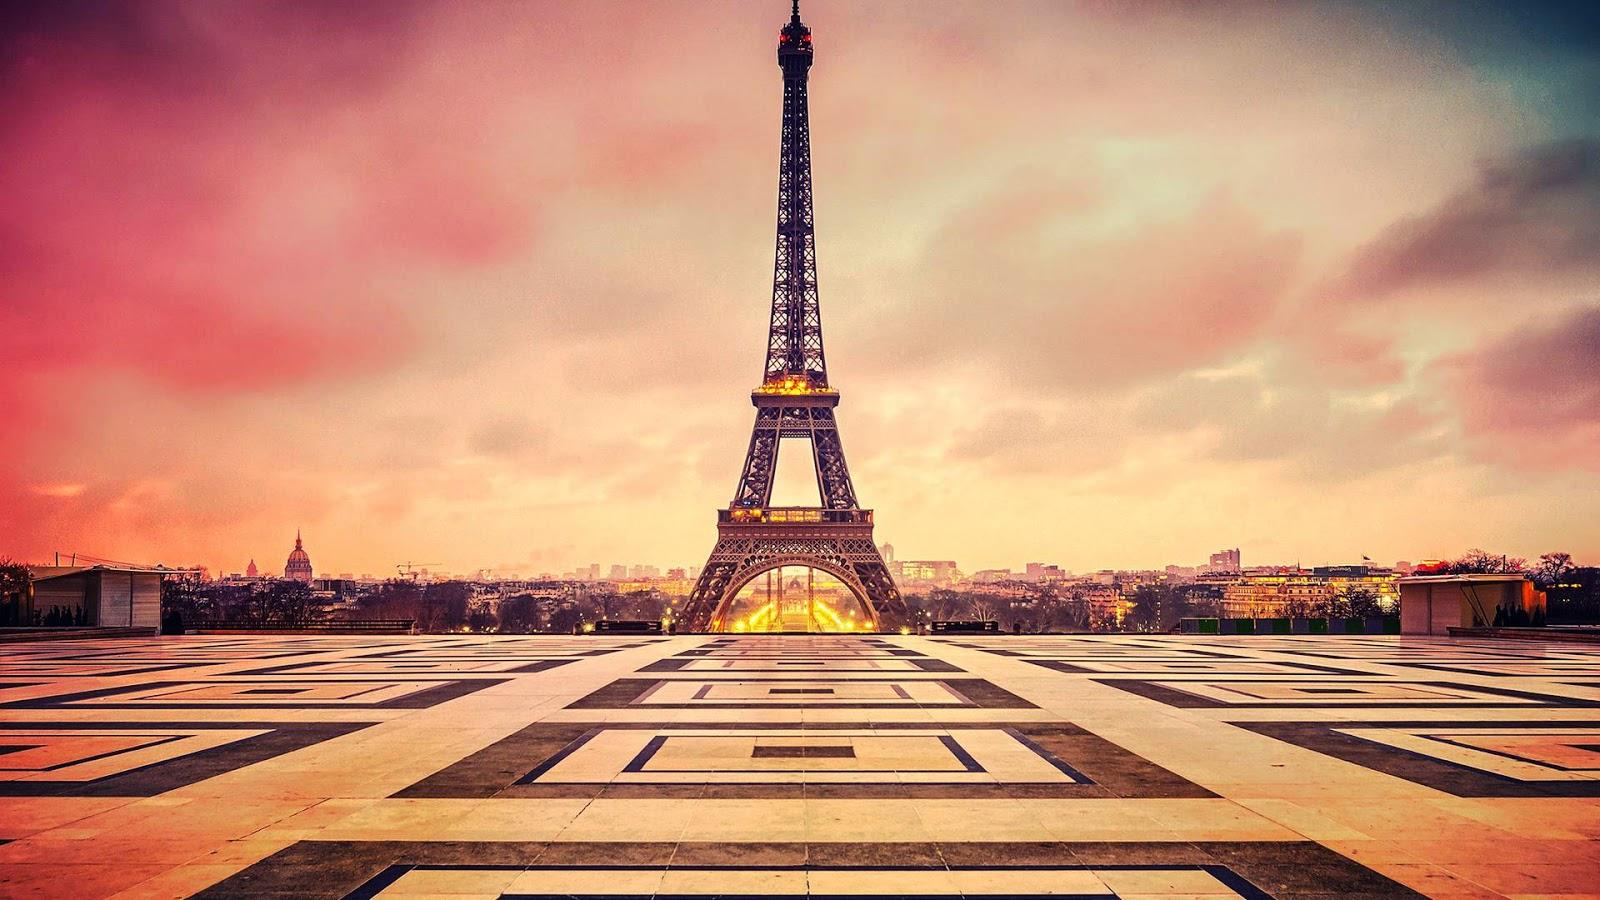 Eiffel Tower Latest Hd Wallpaprs